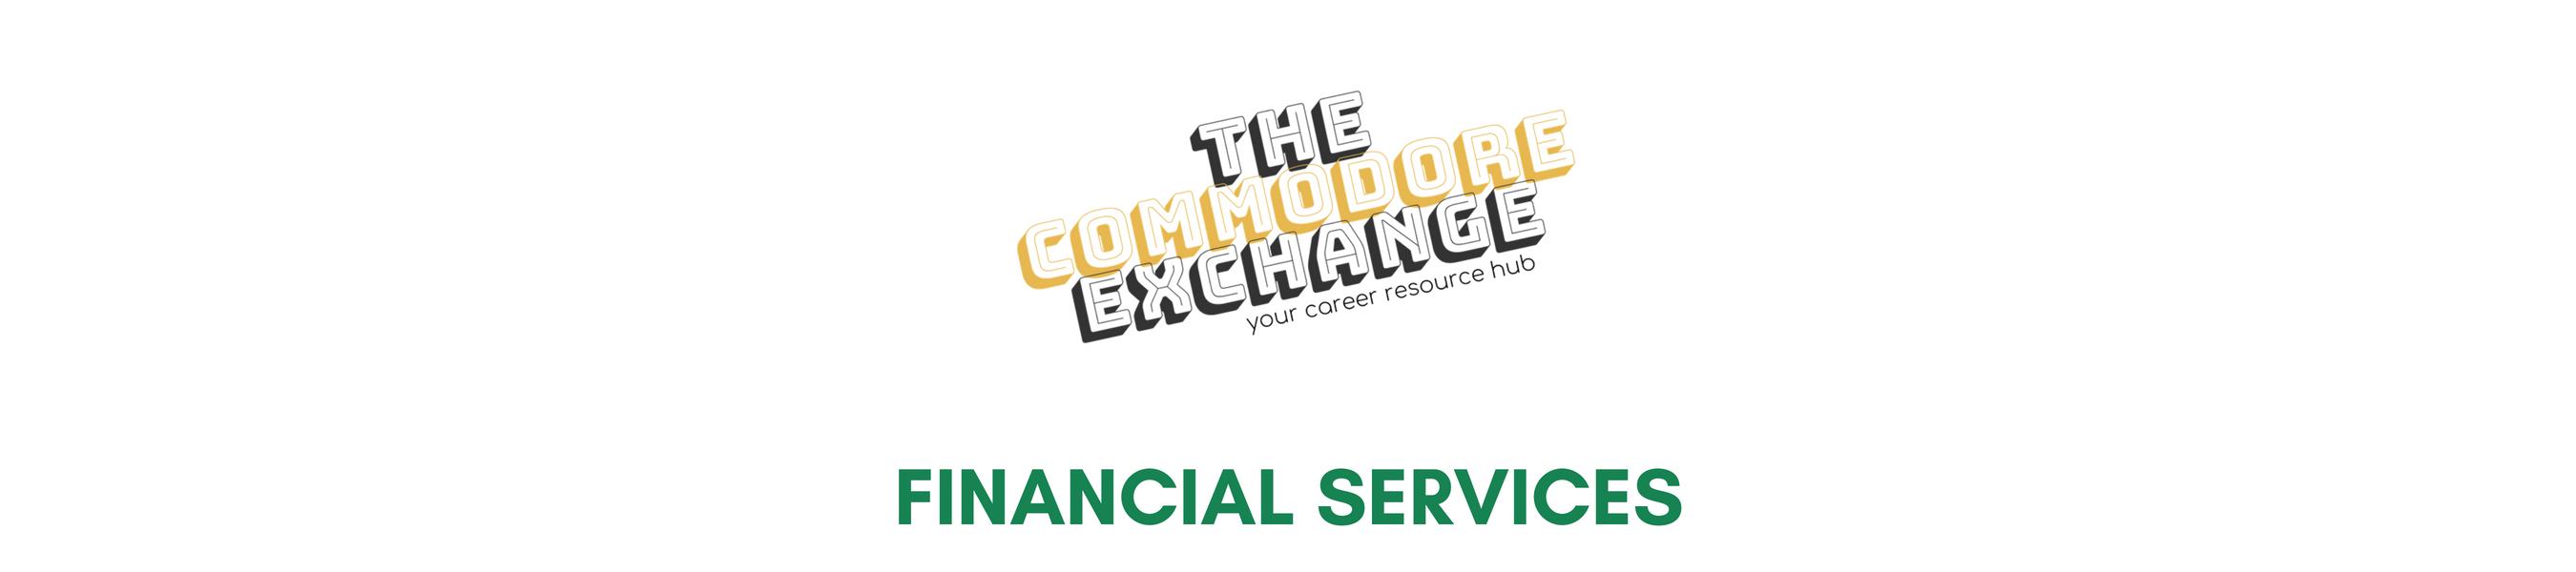 Financial Services   Career Center   Vanderbilt University